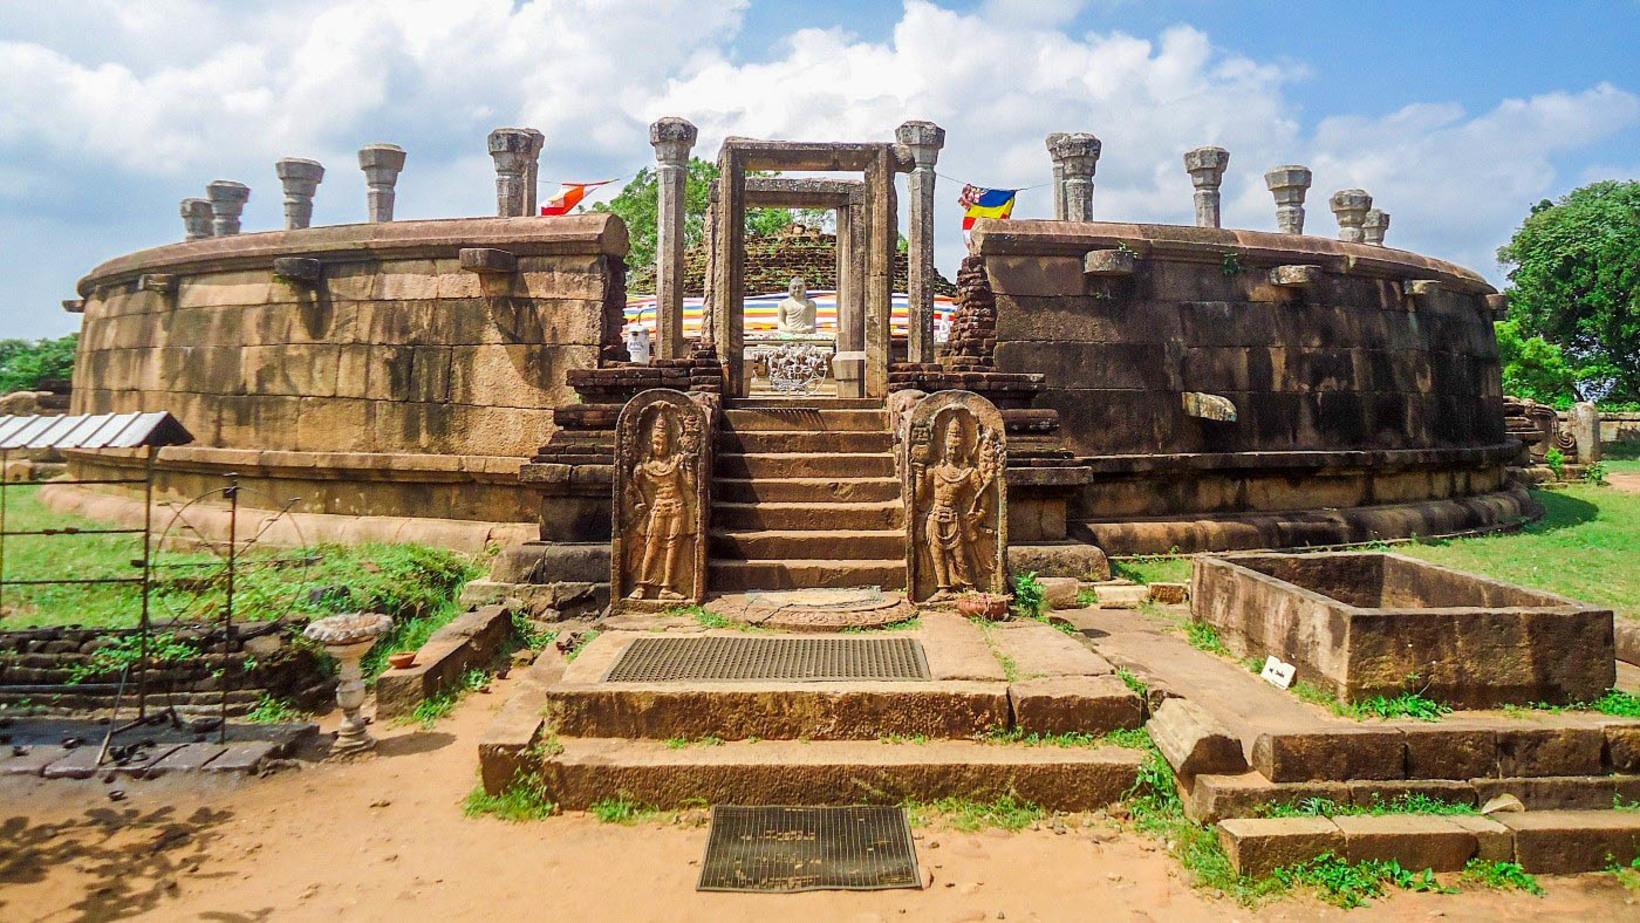 Thiriyaya Girihandu Seya, Trincomalee